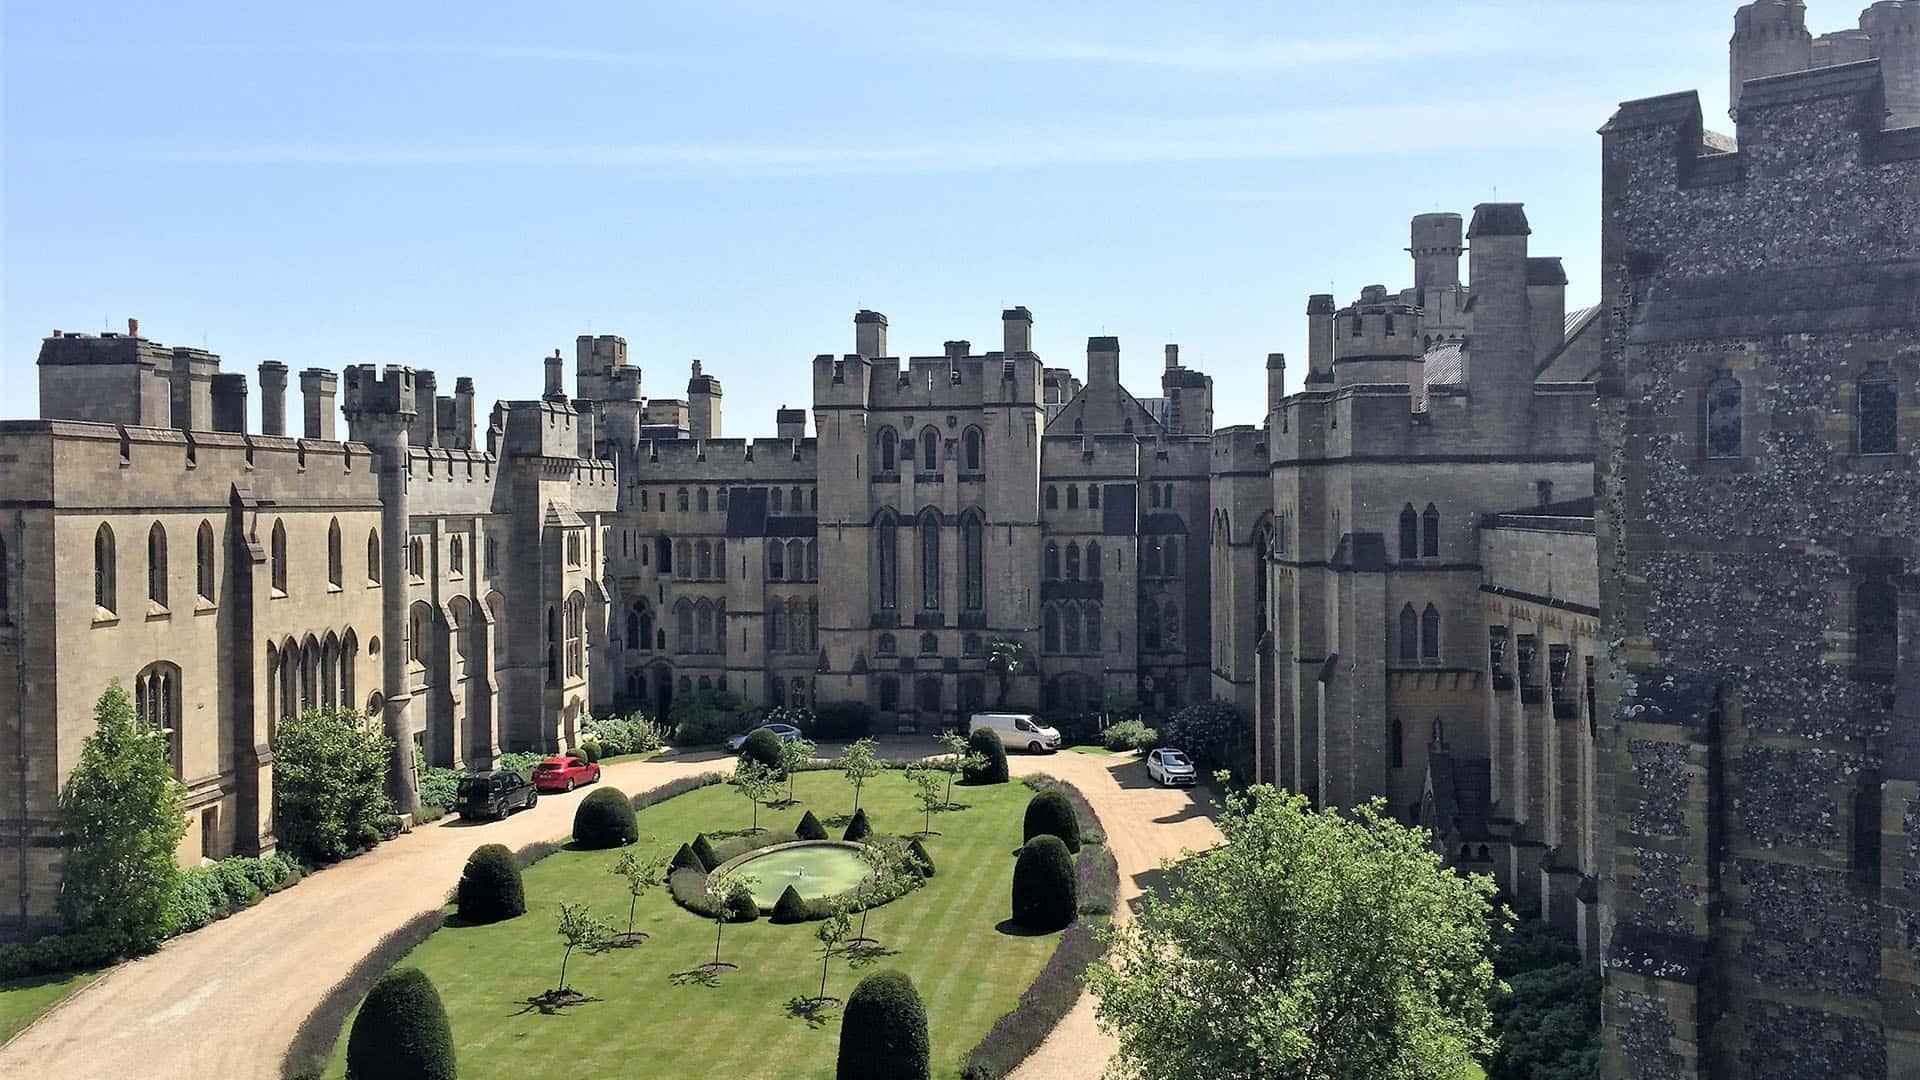 Arundel Castle Court